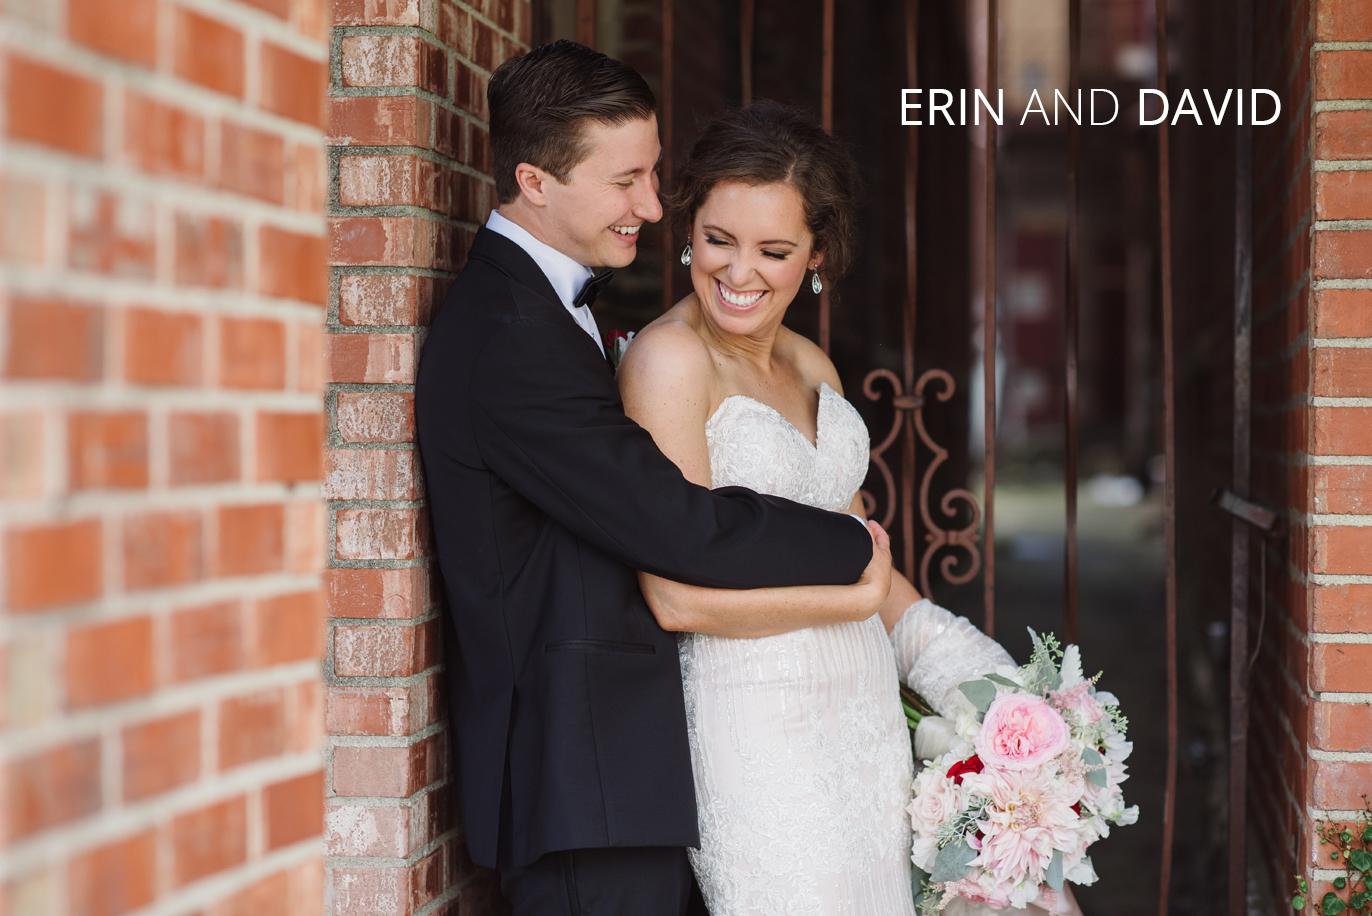 newlyweds hugging against a brick wall